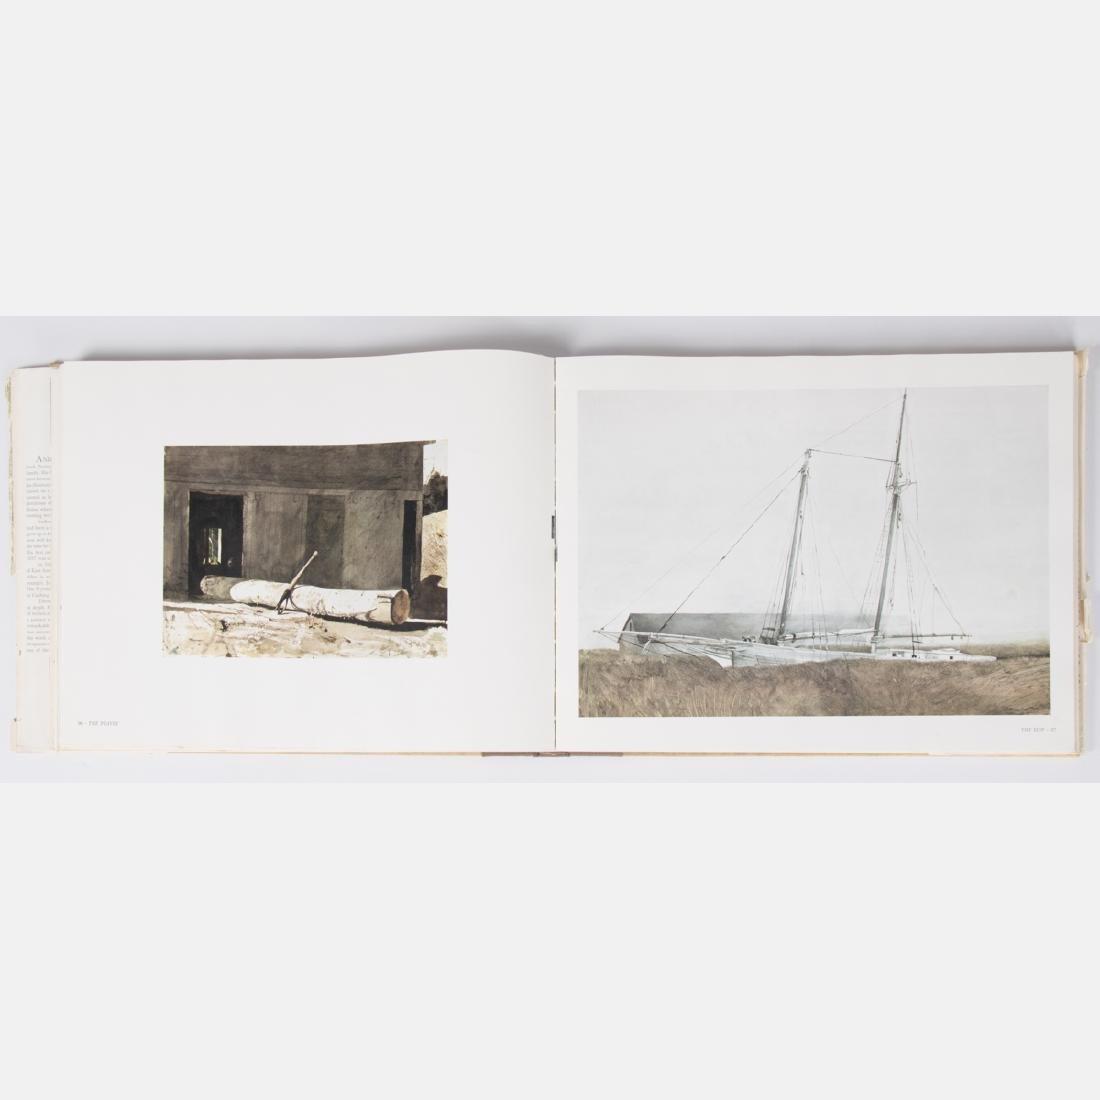 MERYMAN, Richard (1926-2015). Andrew Wyeth. Boston: - 3